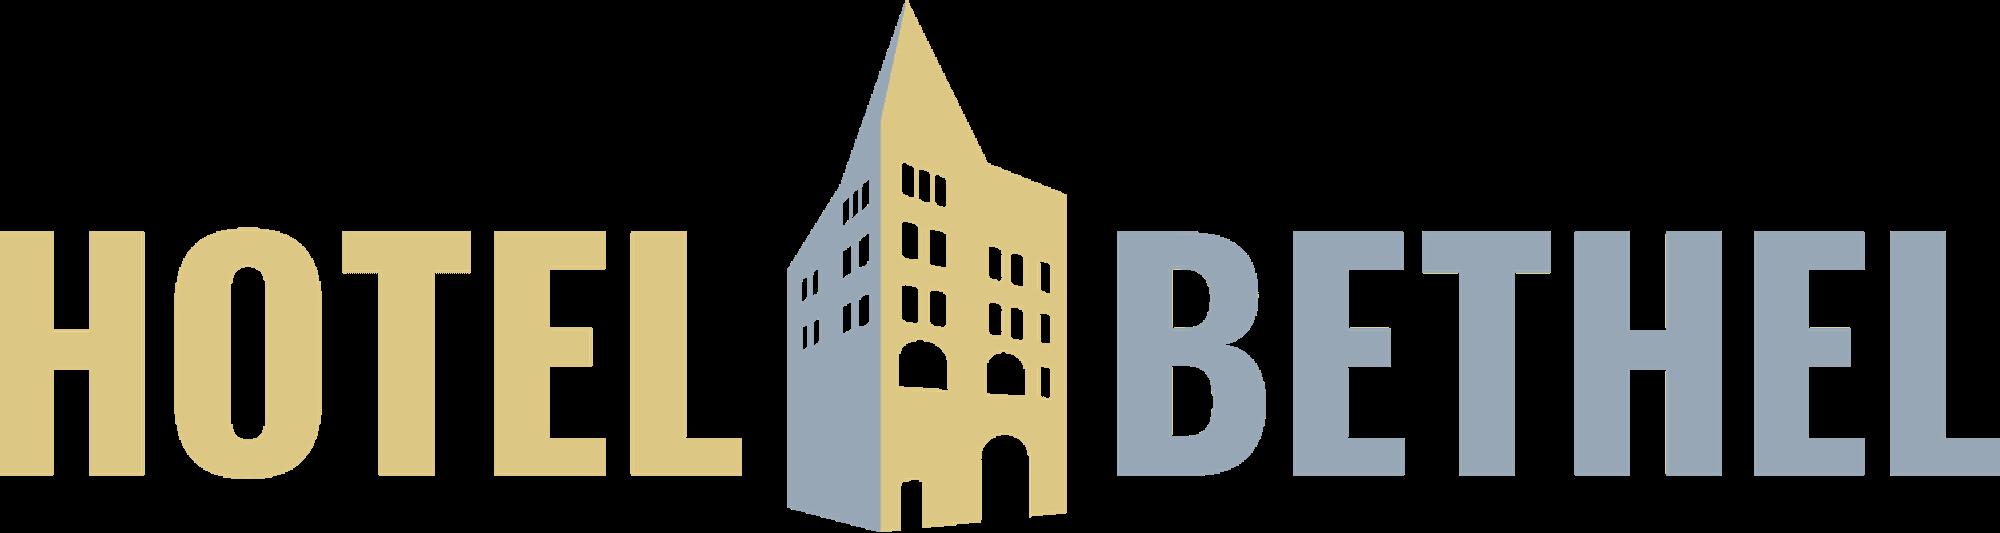 HotelBethel_Logo_2021_Horisontal.png